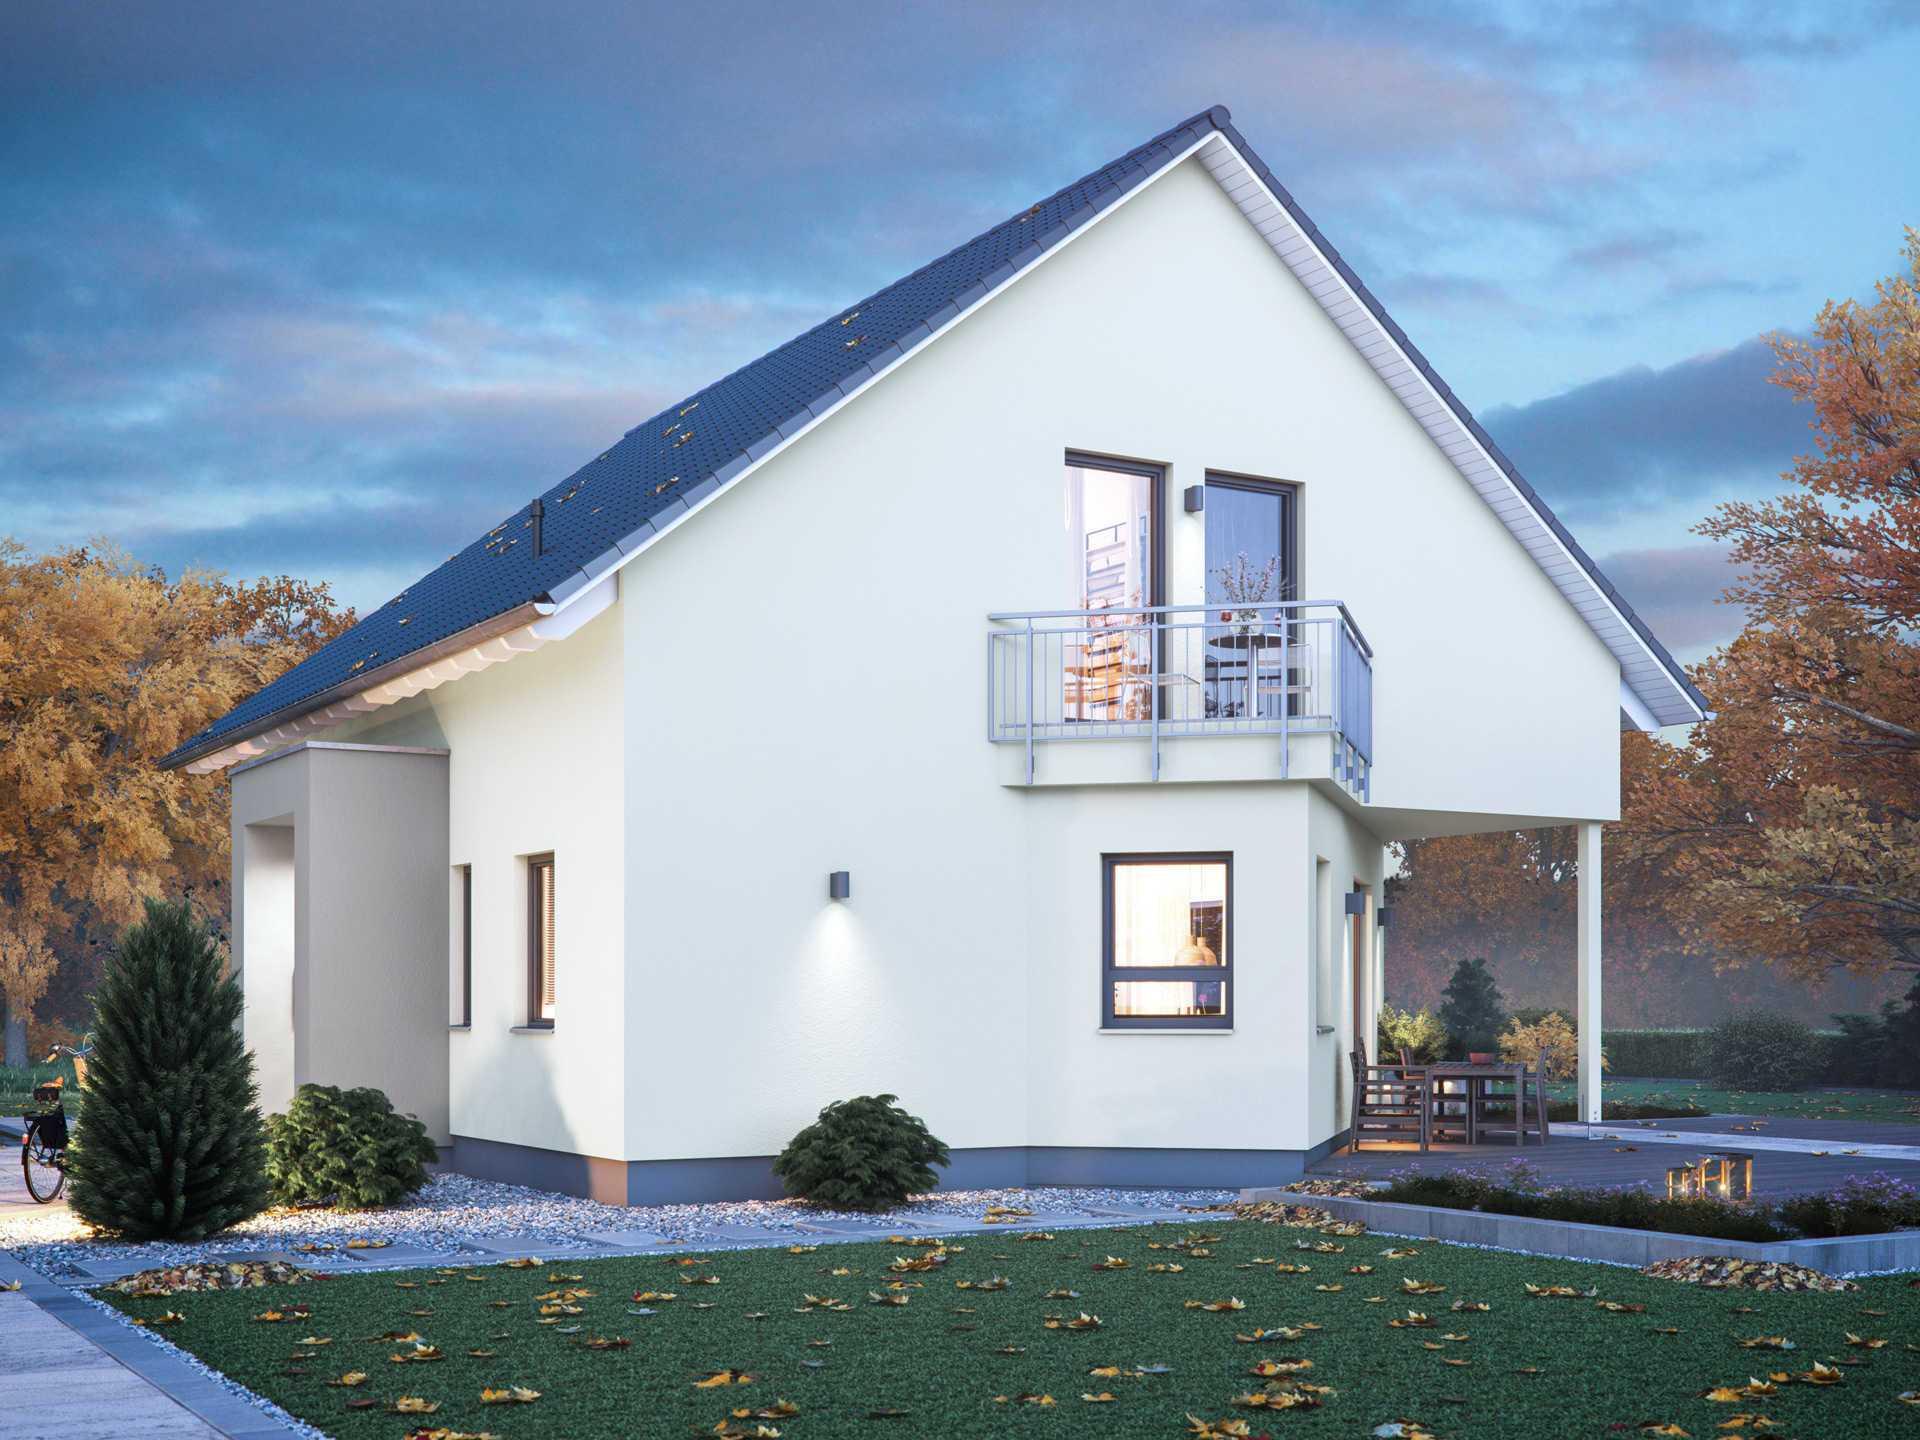 einfamilienhaus lifestyle s massa haus. Black Bedroom Furniture Sets. Home Design Ideas